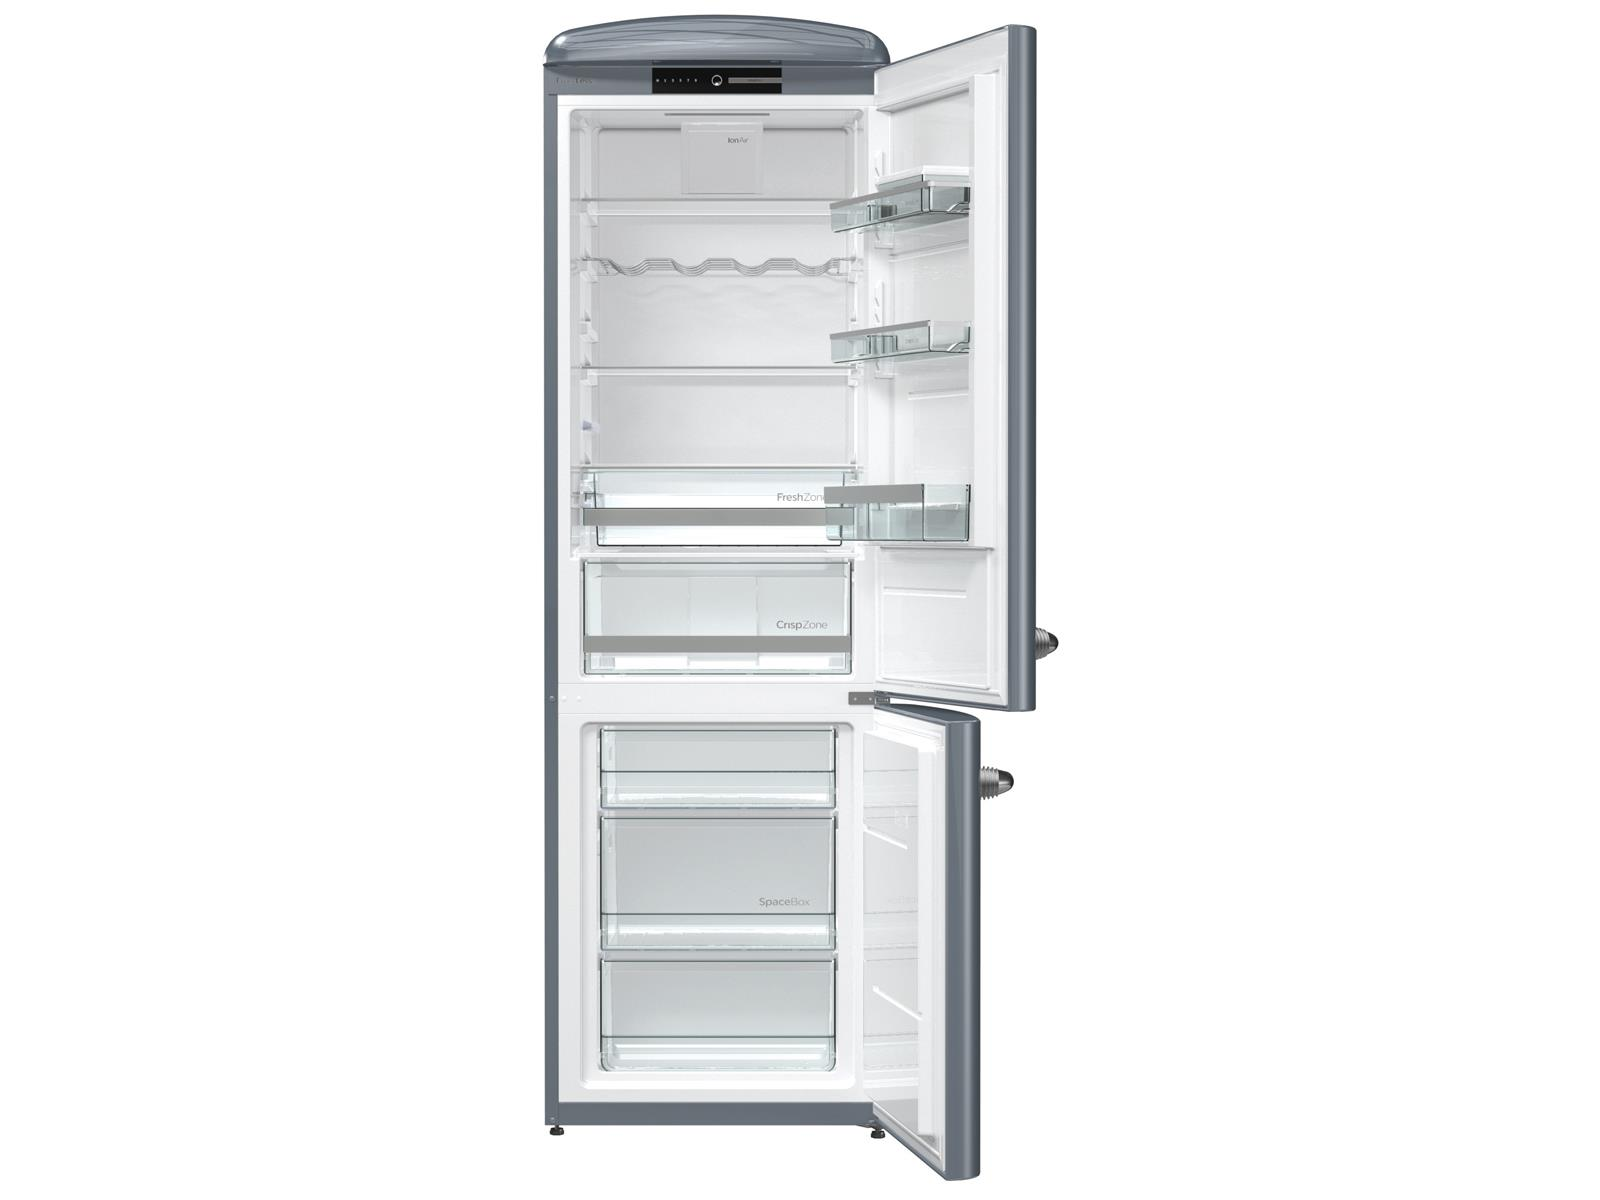 Gorenje Kühlschrank Crispzone : Gorenje kühlschrank test vergleich gorenje kühlschrank kaufen